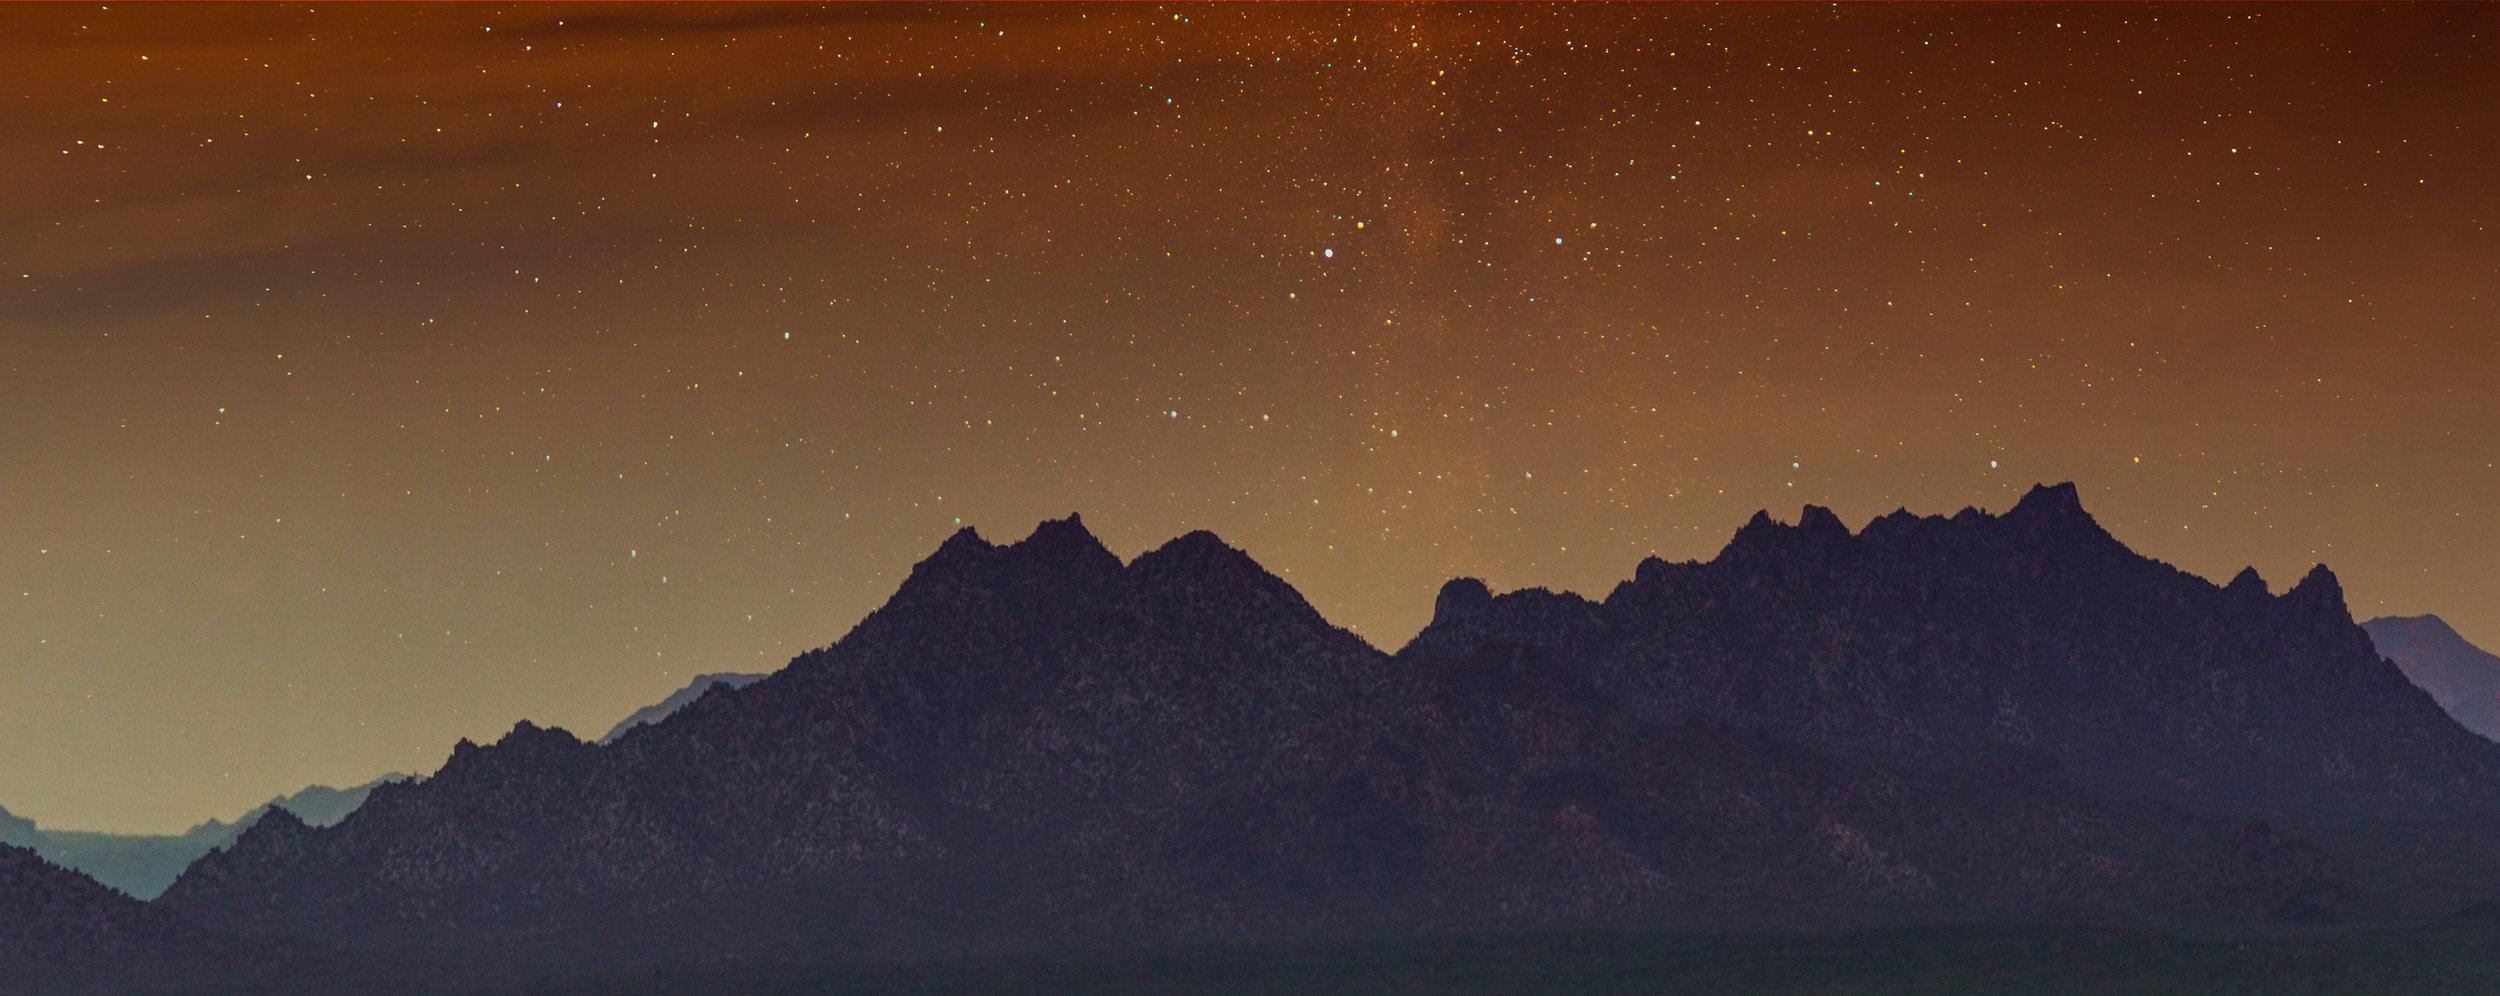 Mountain Galaxy.jpg